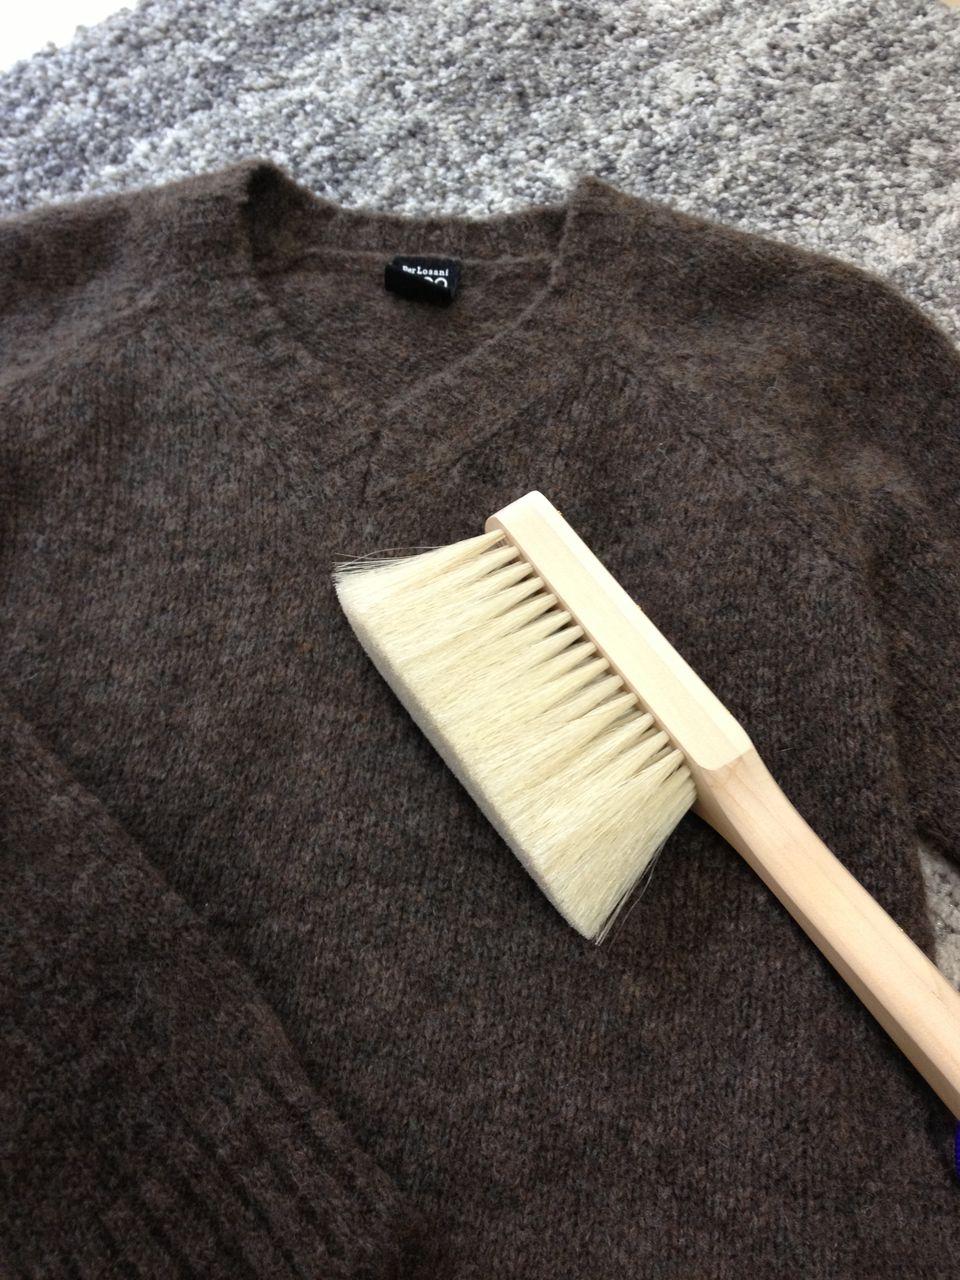 Xpassion 洋服ブラシ 馬毛 静電除去 天然木 靴ブラシ スーツブラシ 清掃用